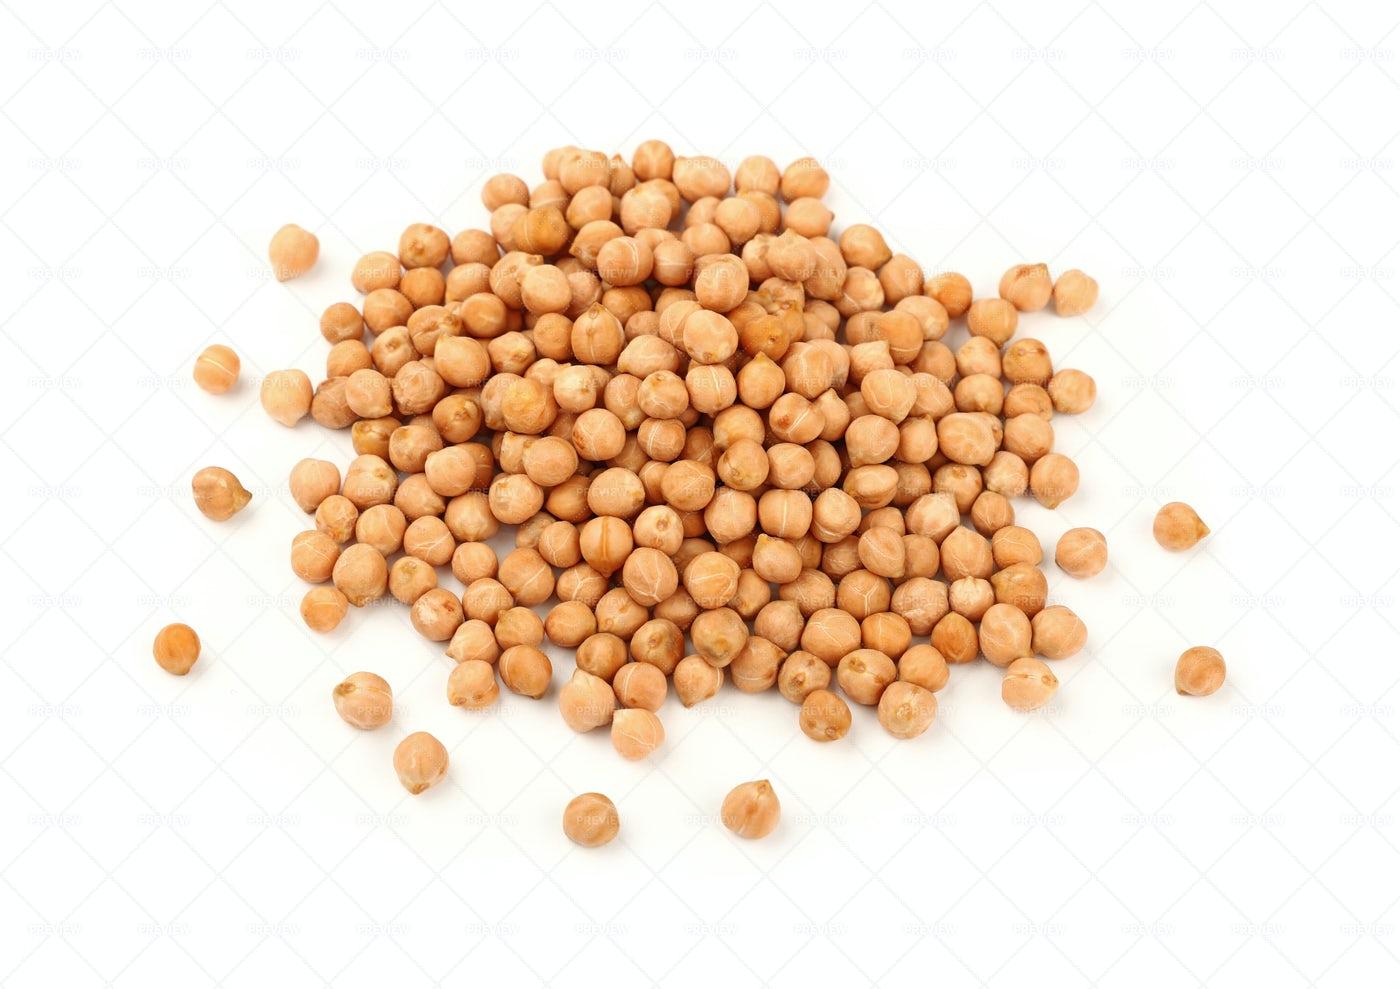 Heap Of Chickpea Beans: Stock Photos